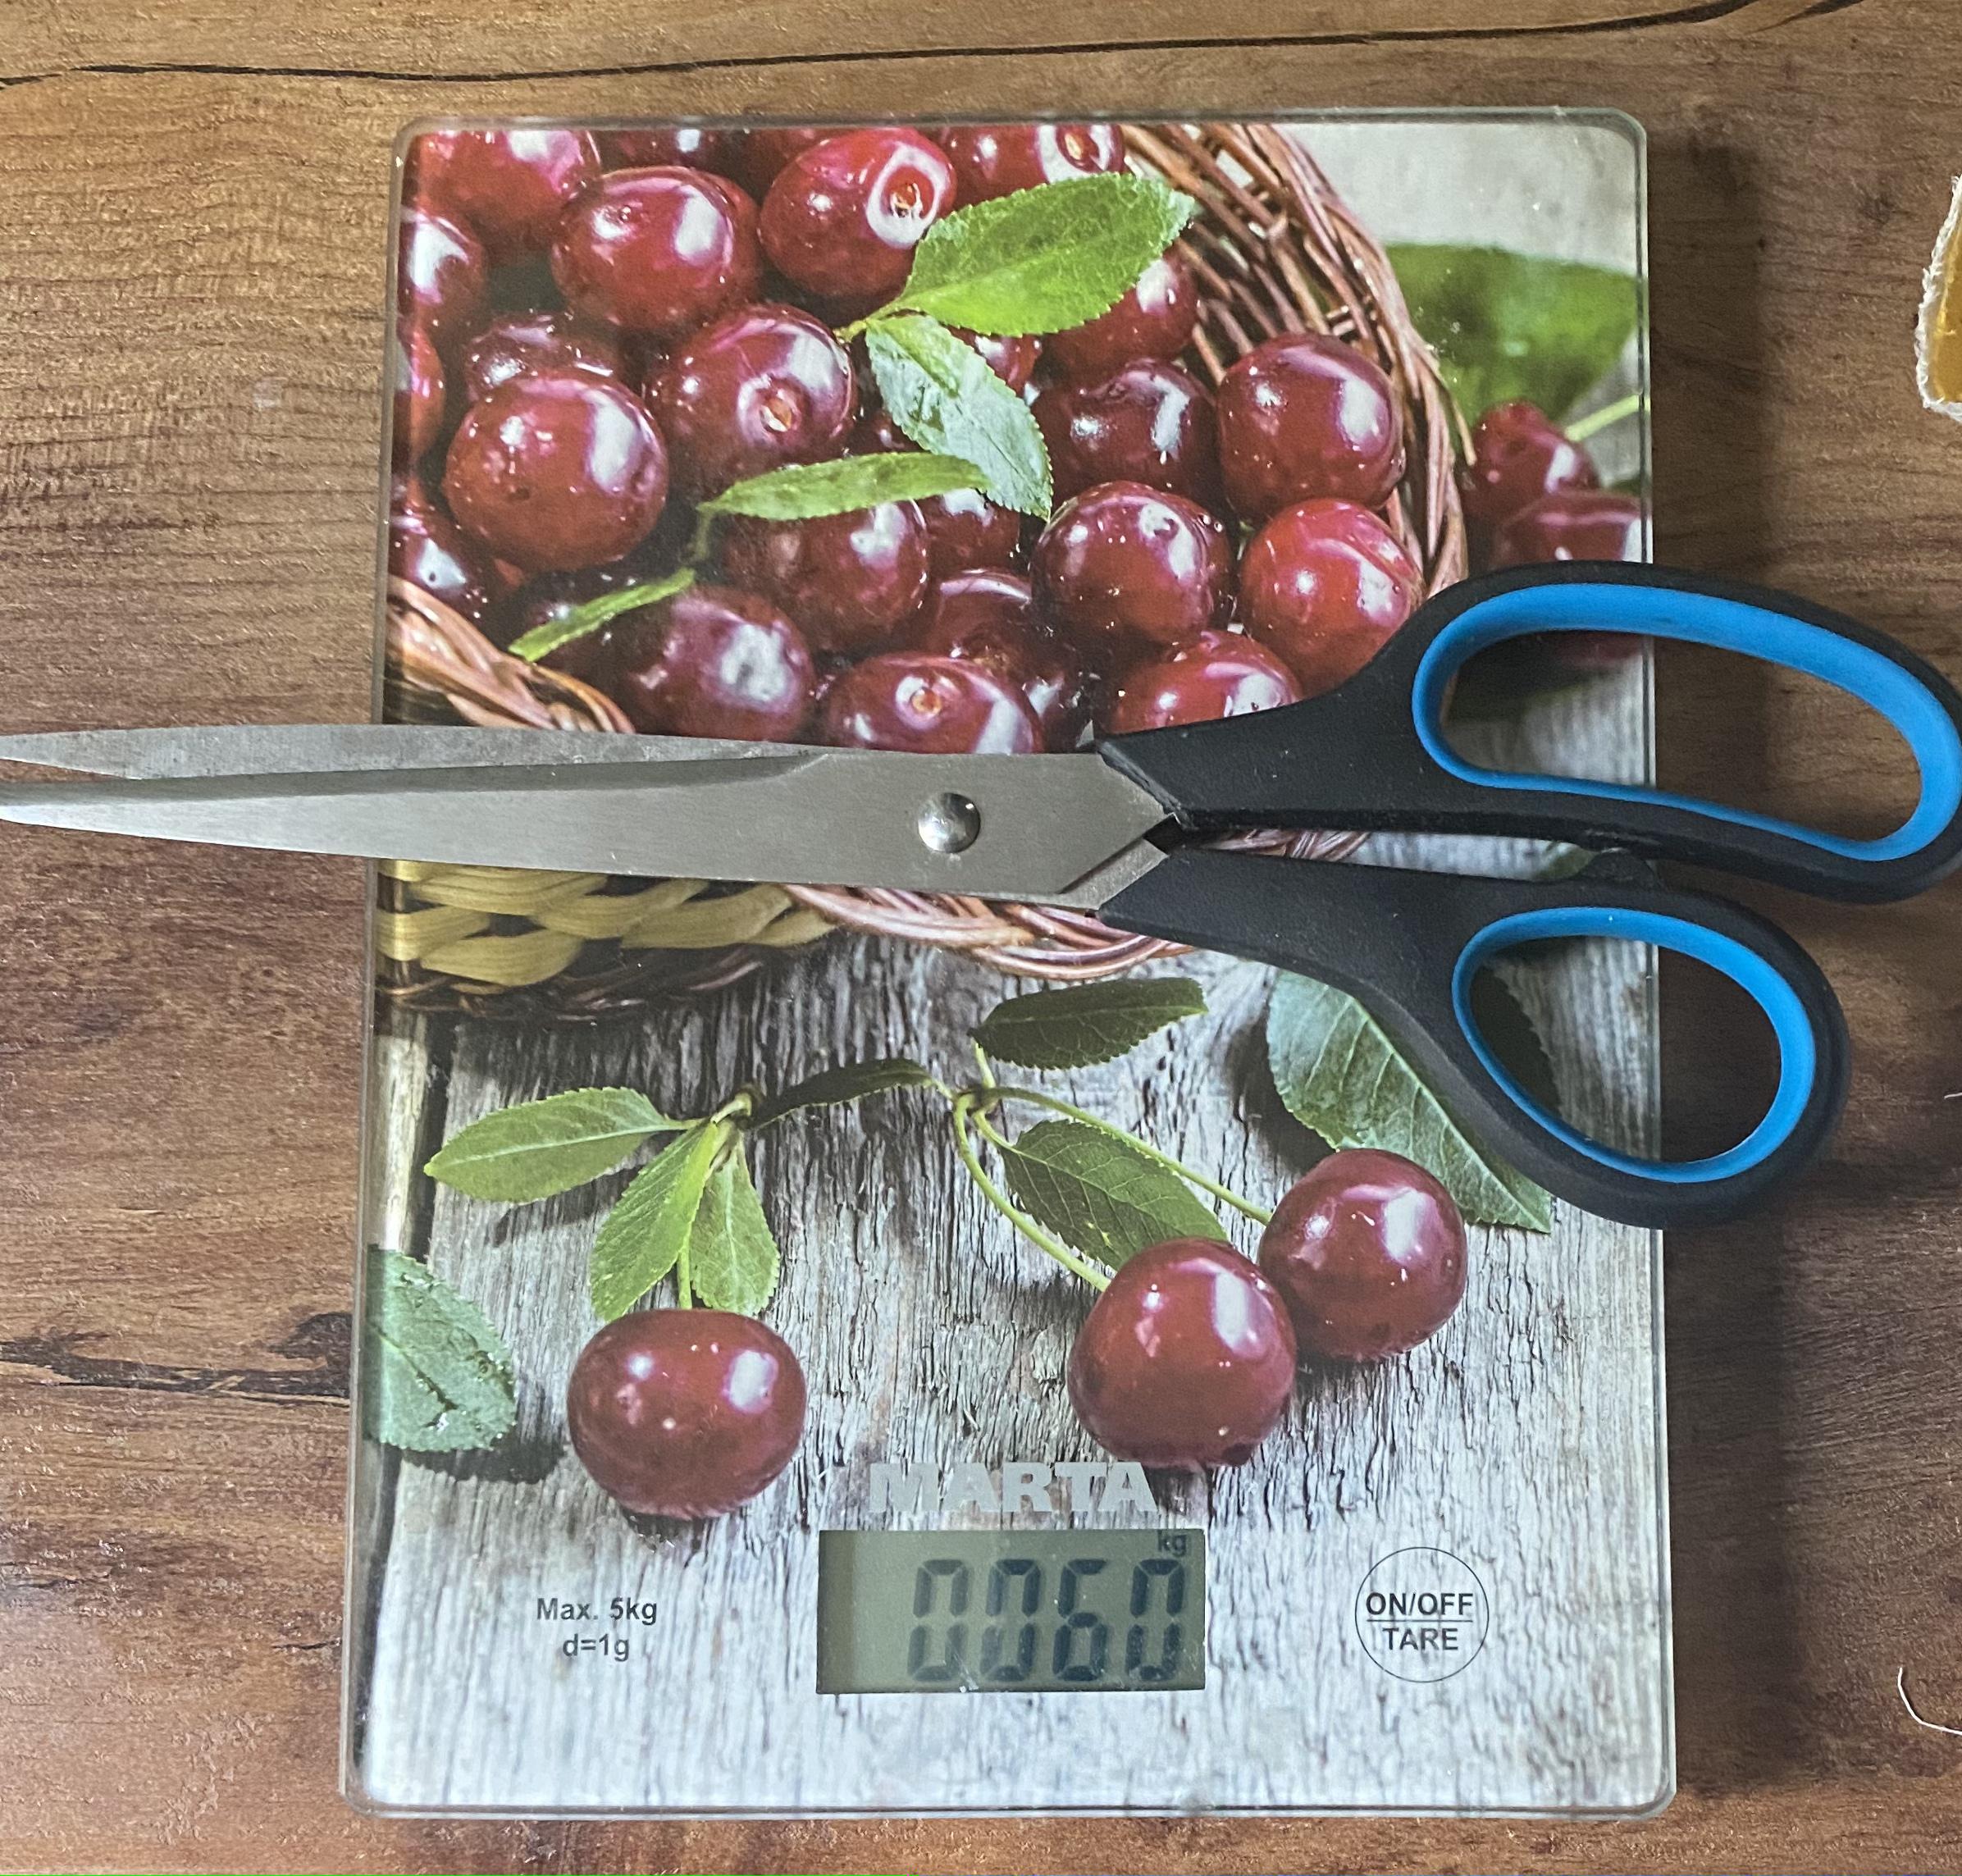 вес канцелярских ножниц fix price